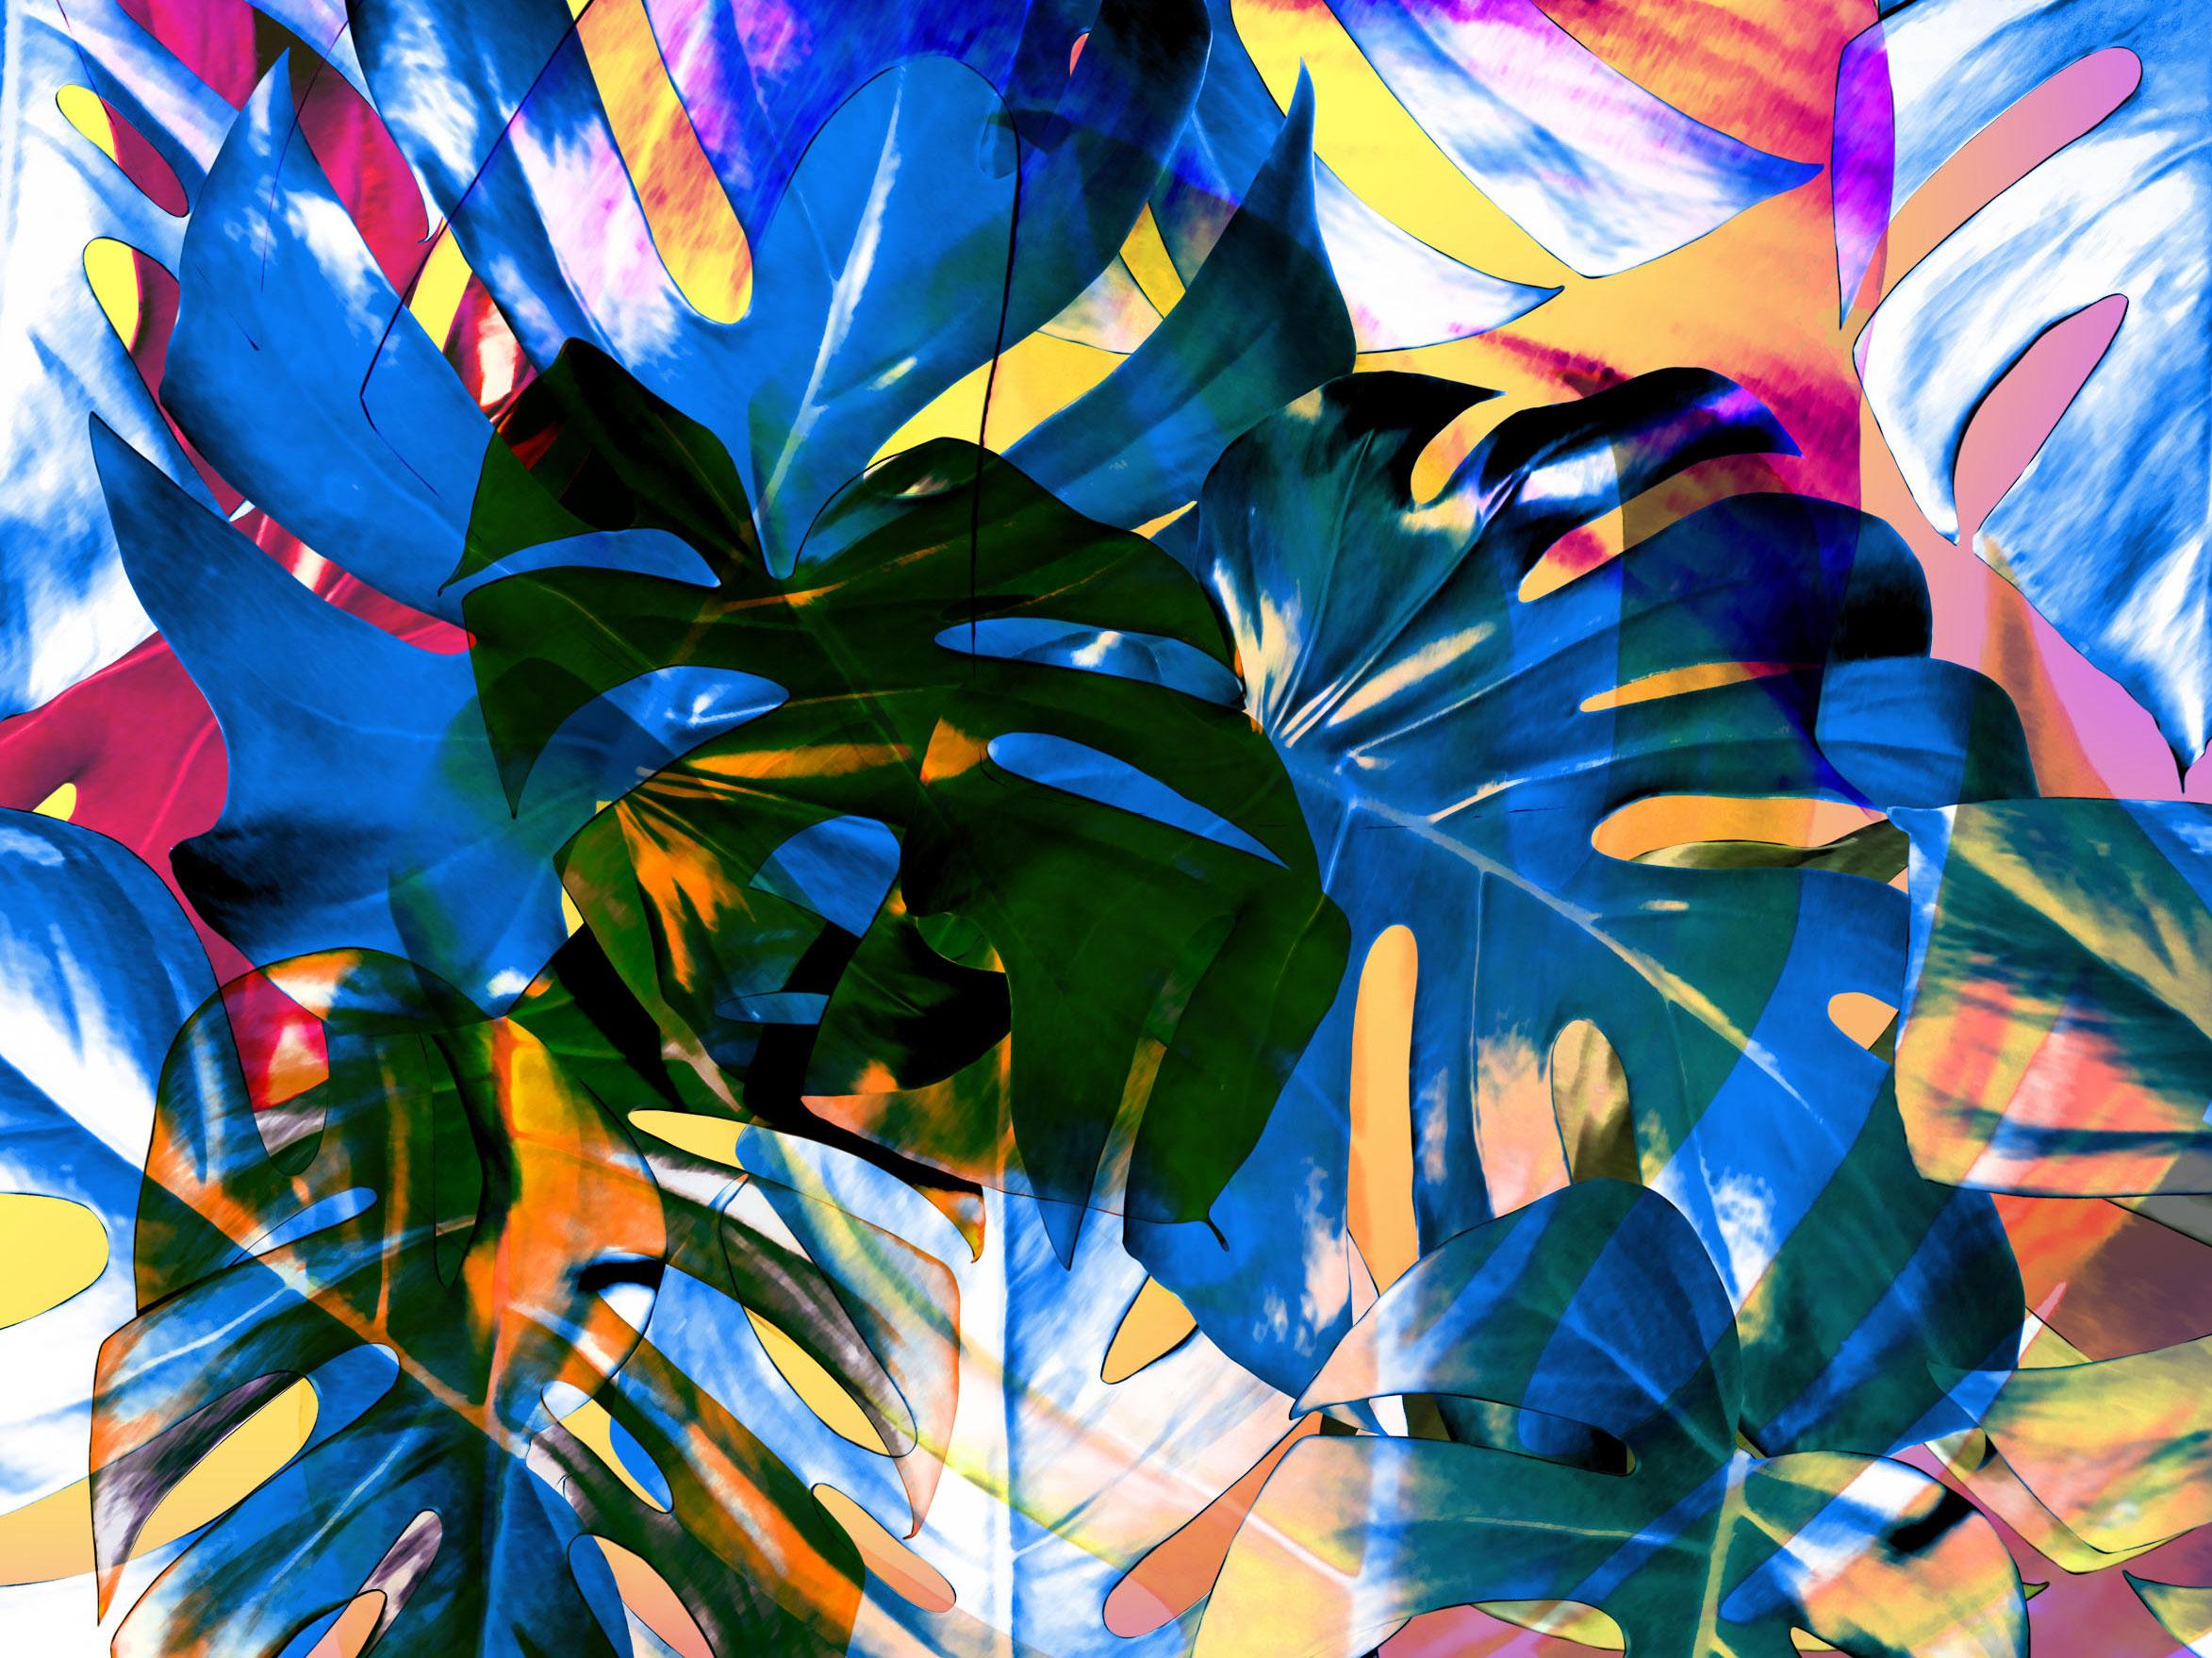 olympics-rio-patterns-03